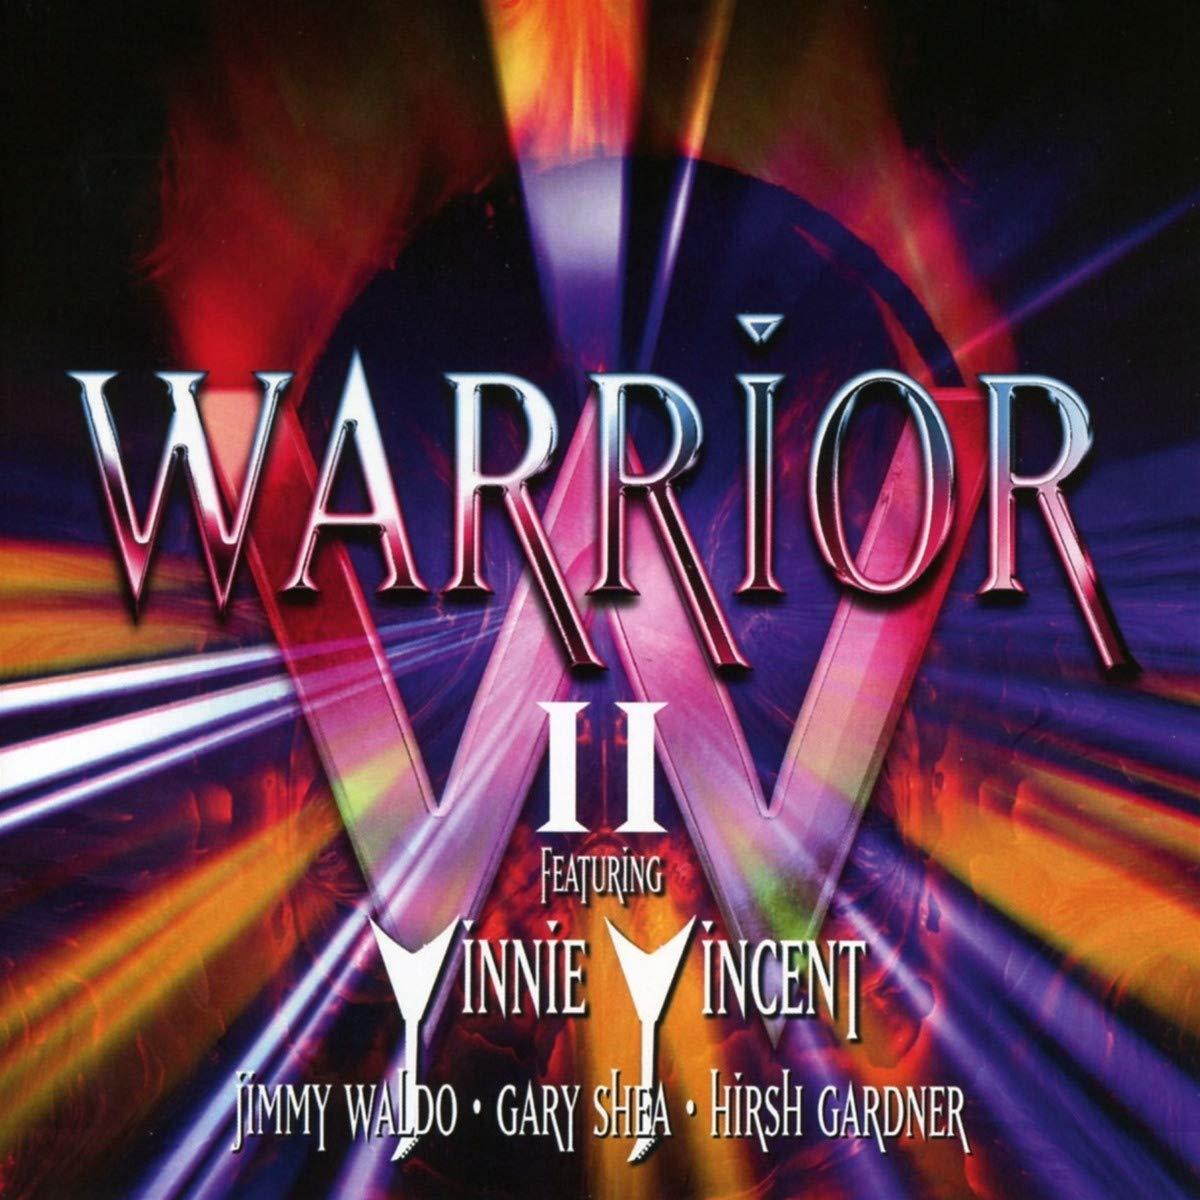 Vinnie Vincent - Page 31 71YkcHsmCsL._SL1200_